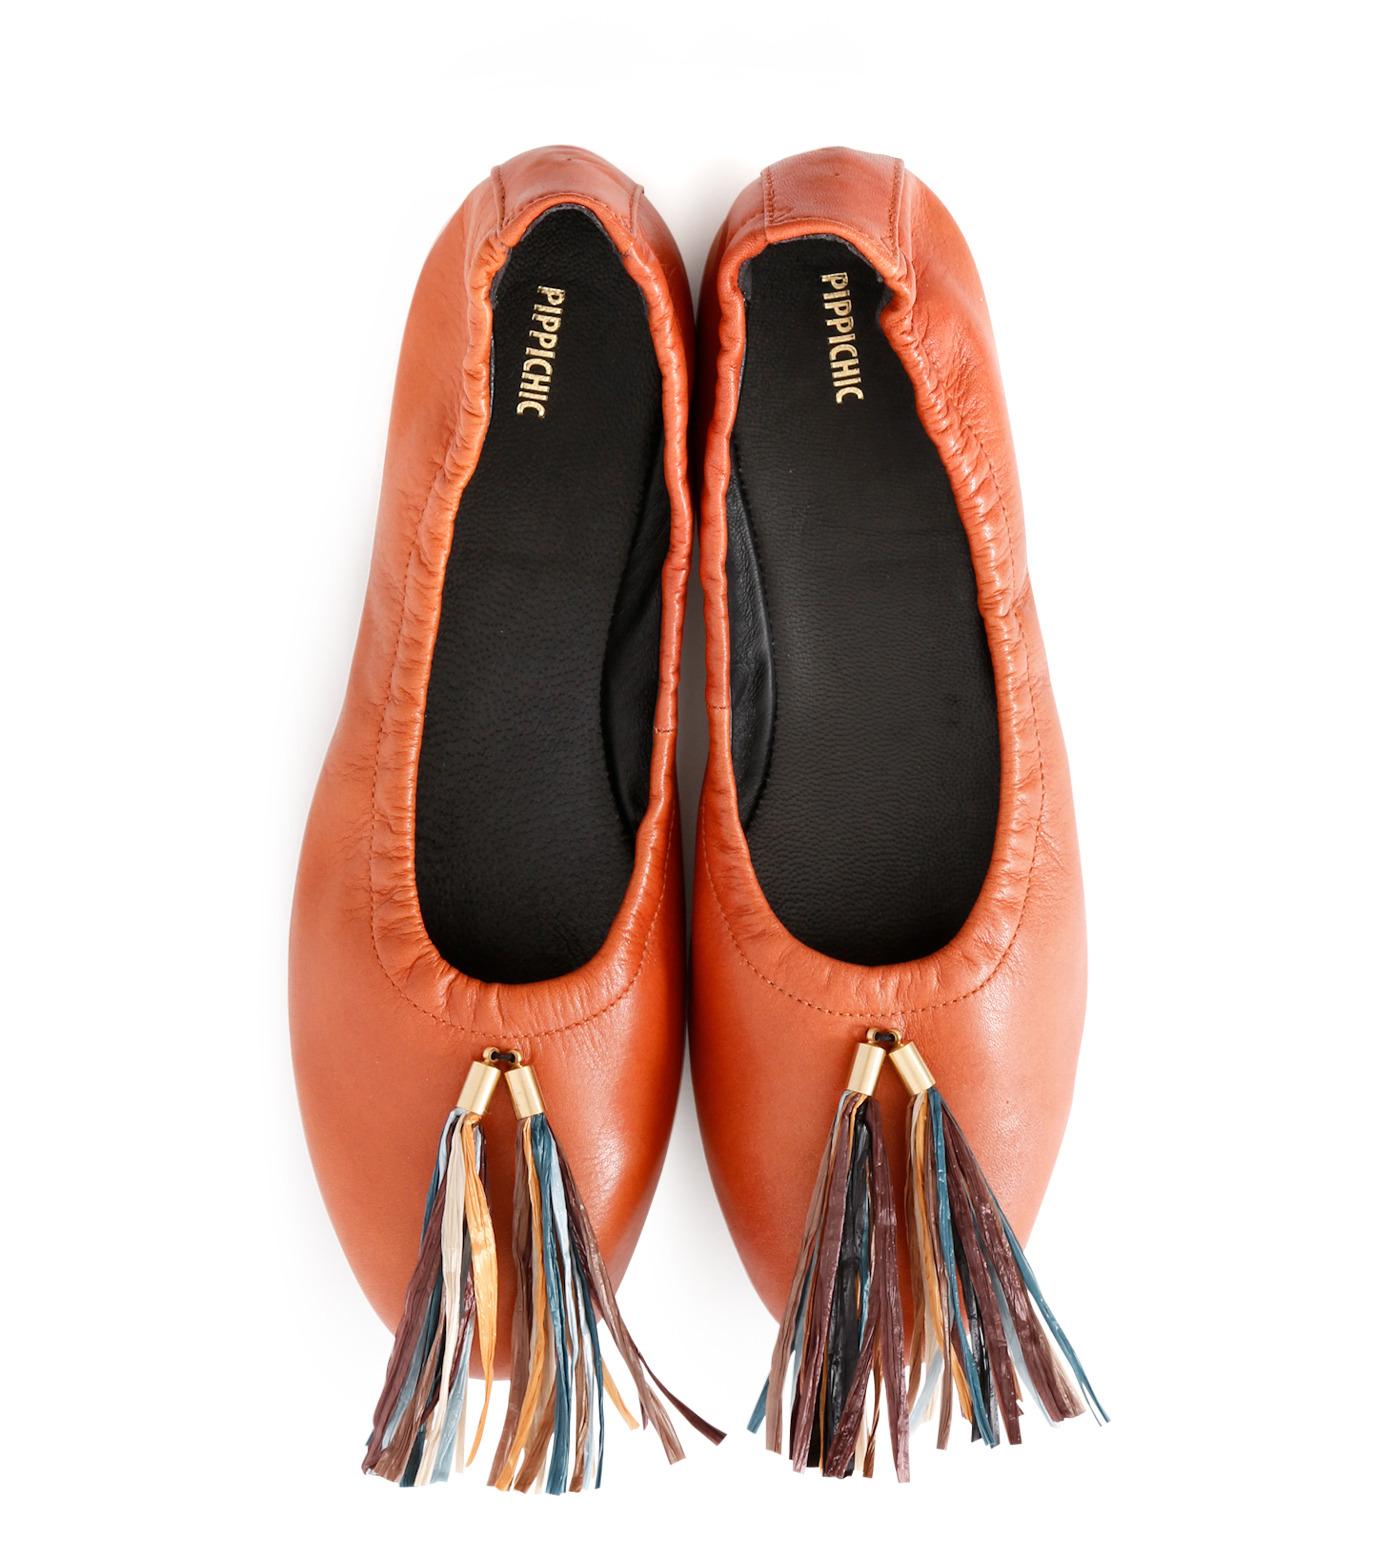 PIPPICHIC(ピッピシック)のballet shoes-DARK BROWN(シューズ/shoes)-PP16BALLET19-43 拡大詳細画像4